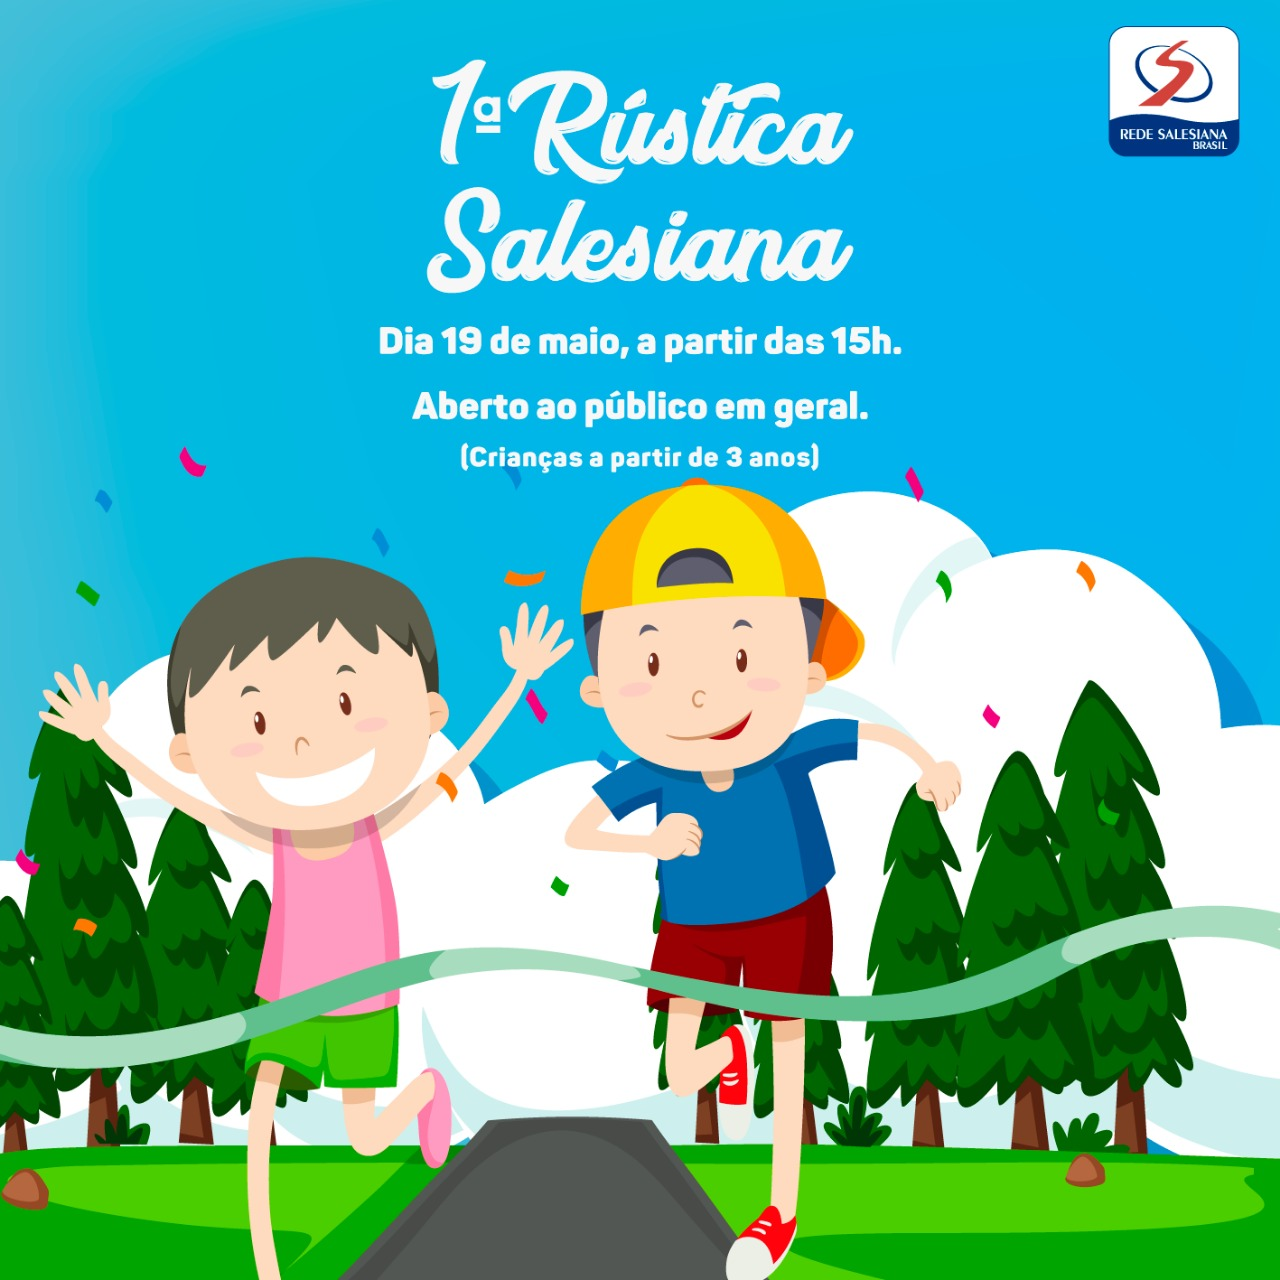 R_stica